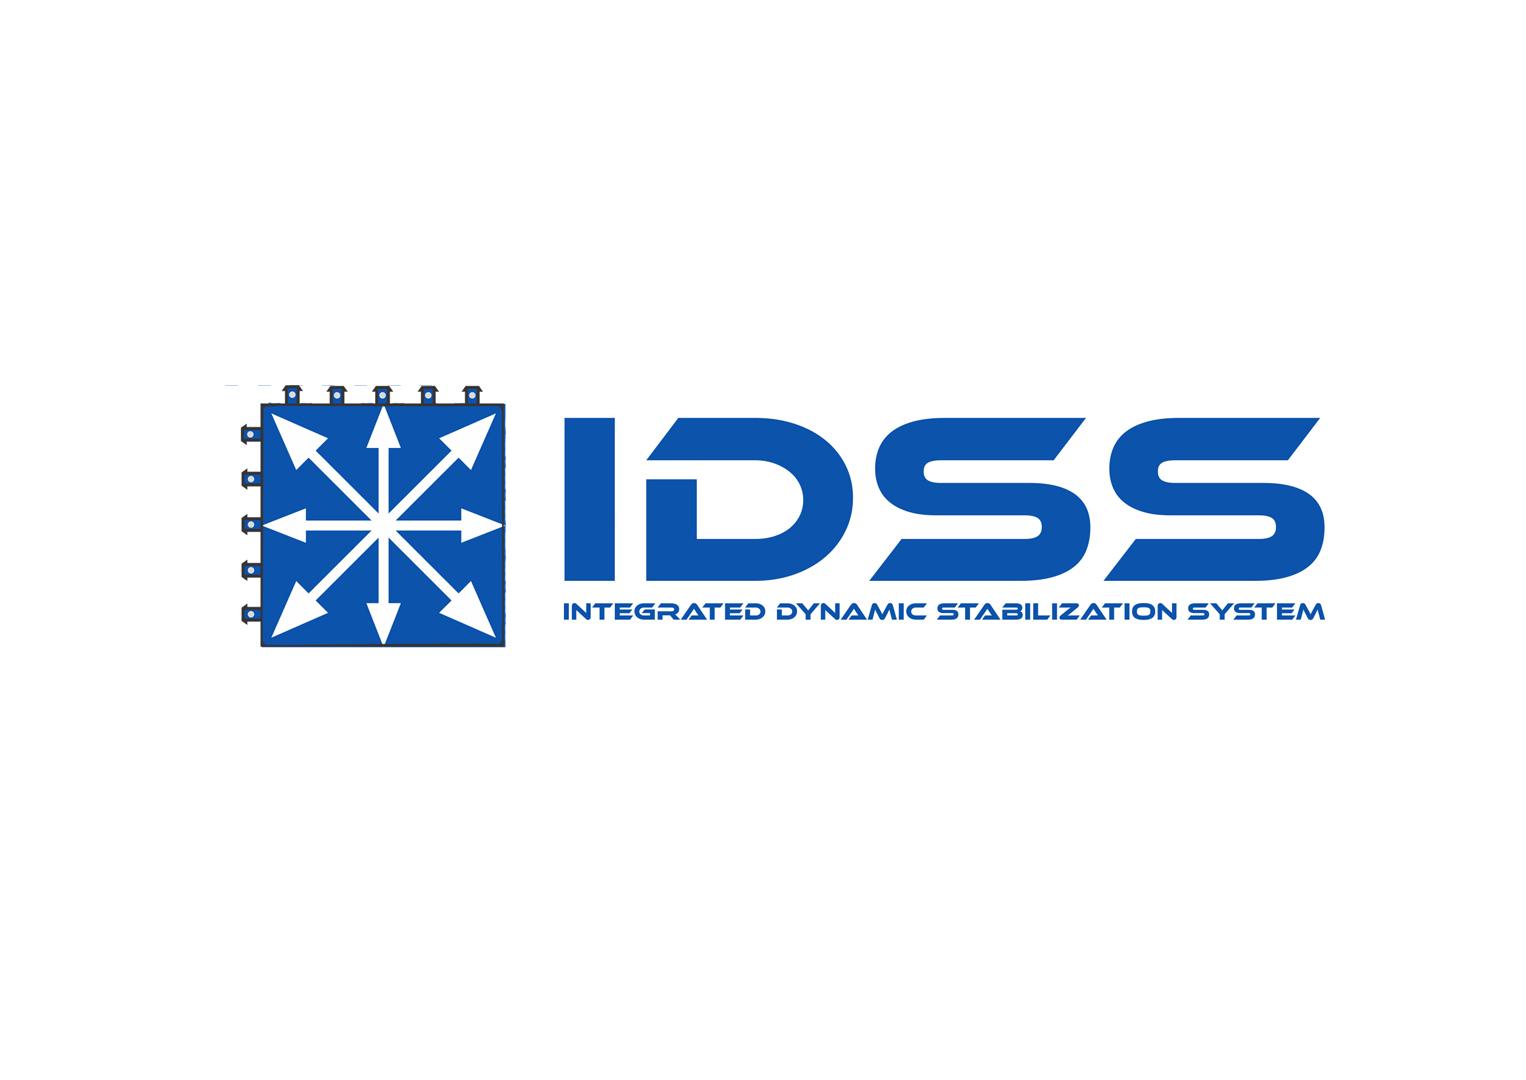 IDSS-Integrated-Dynamic-Stabilization-System-peq.jpg